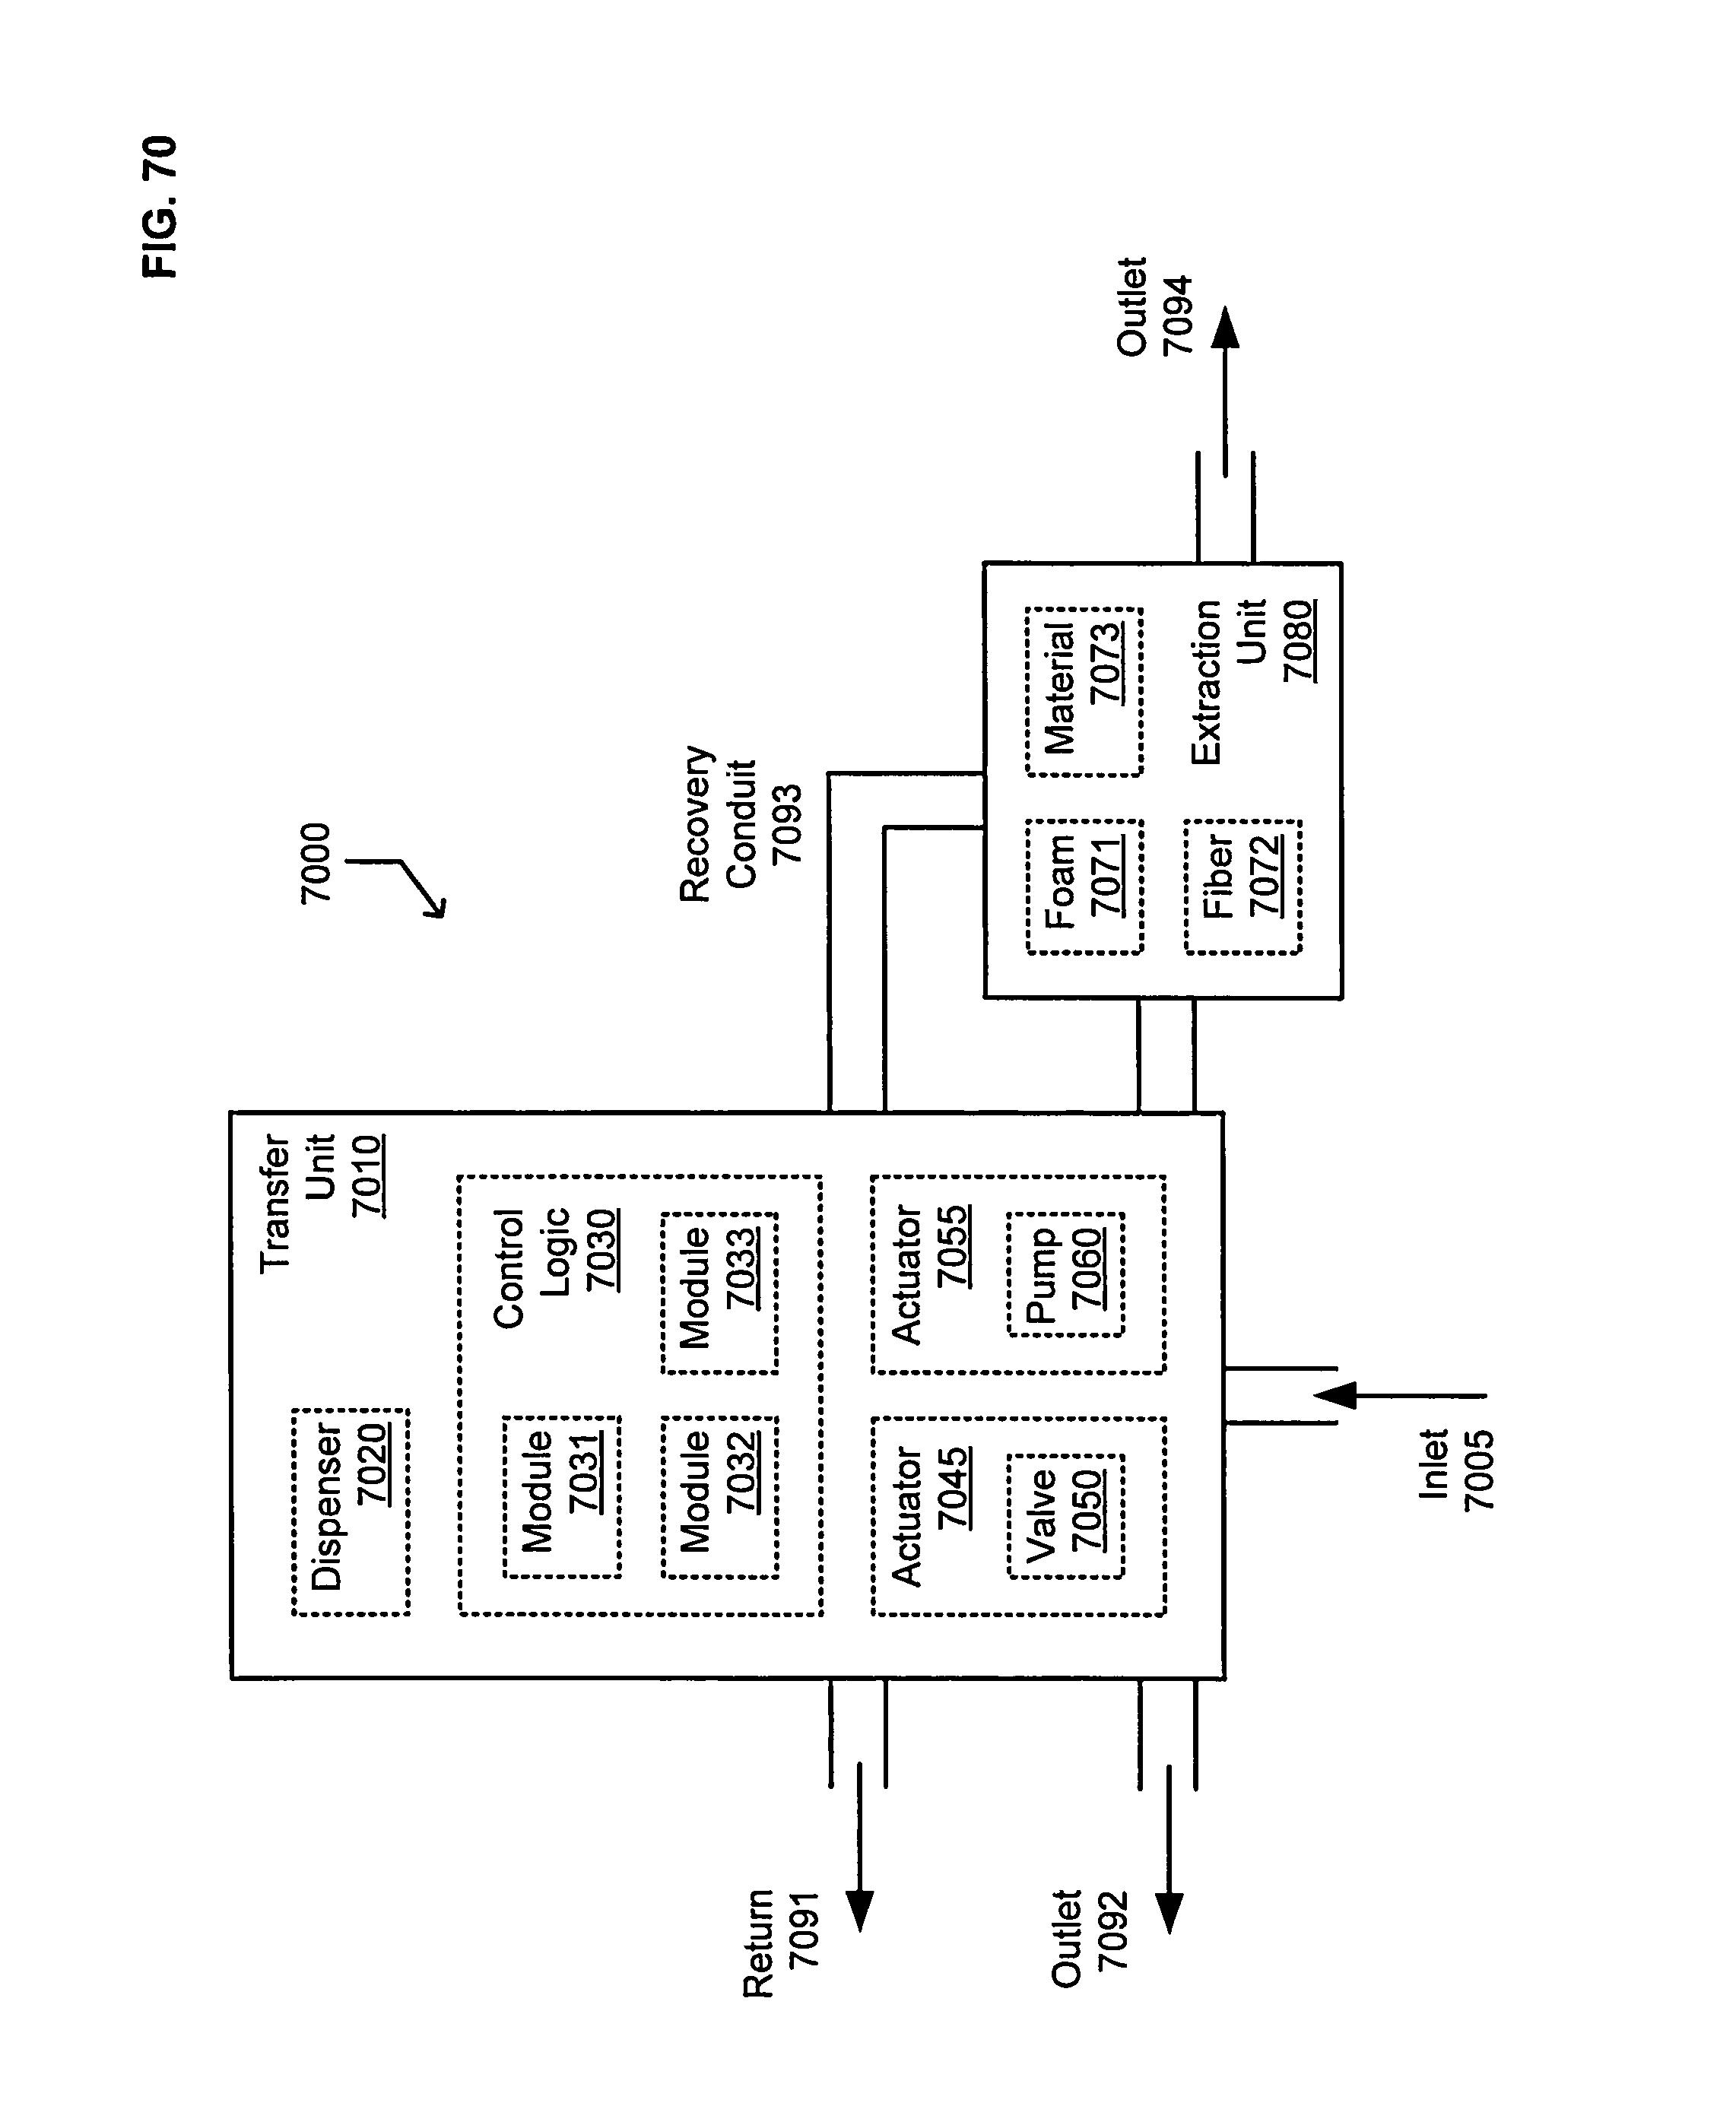 Patent US 8,870,813 B2 on